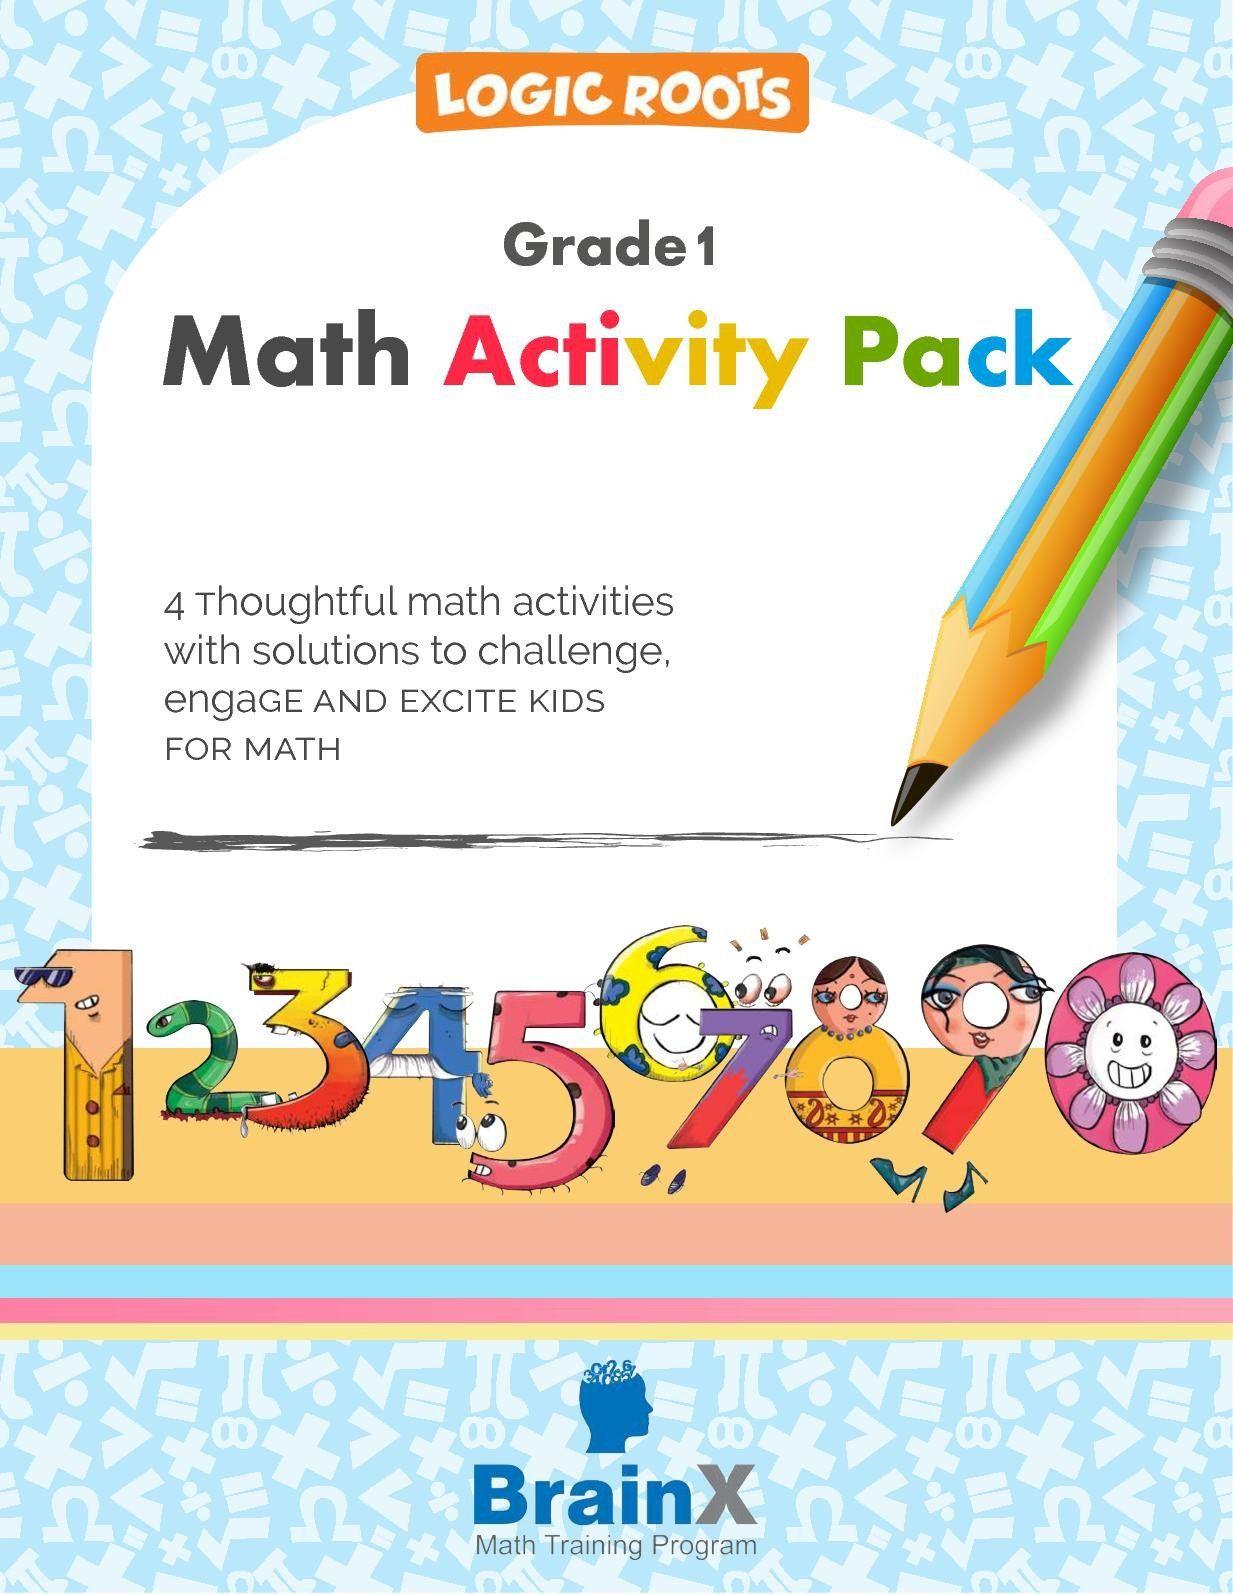 1st Grade Subtraction Worksheets Calaméo 1st Grade or First Grade Math  Worksheets in 2020   Math worksheets [ 1595 x 1233 Pixel ]